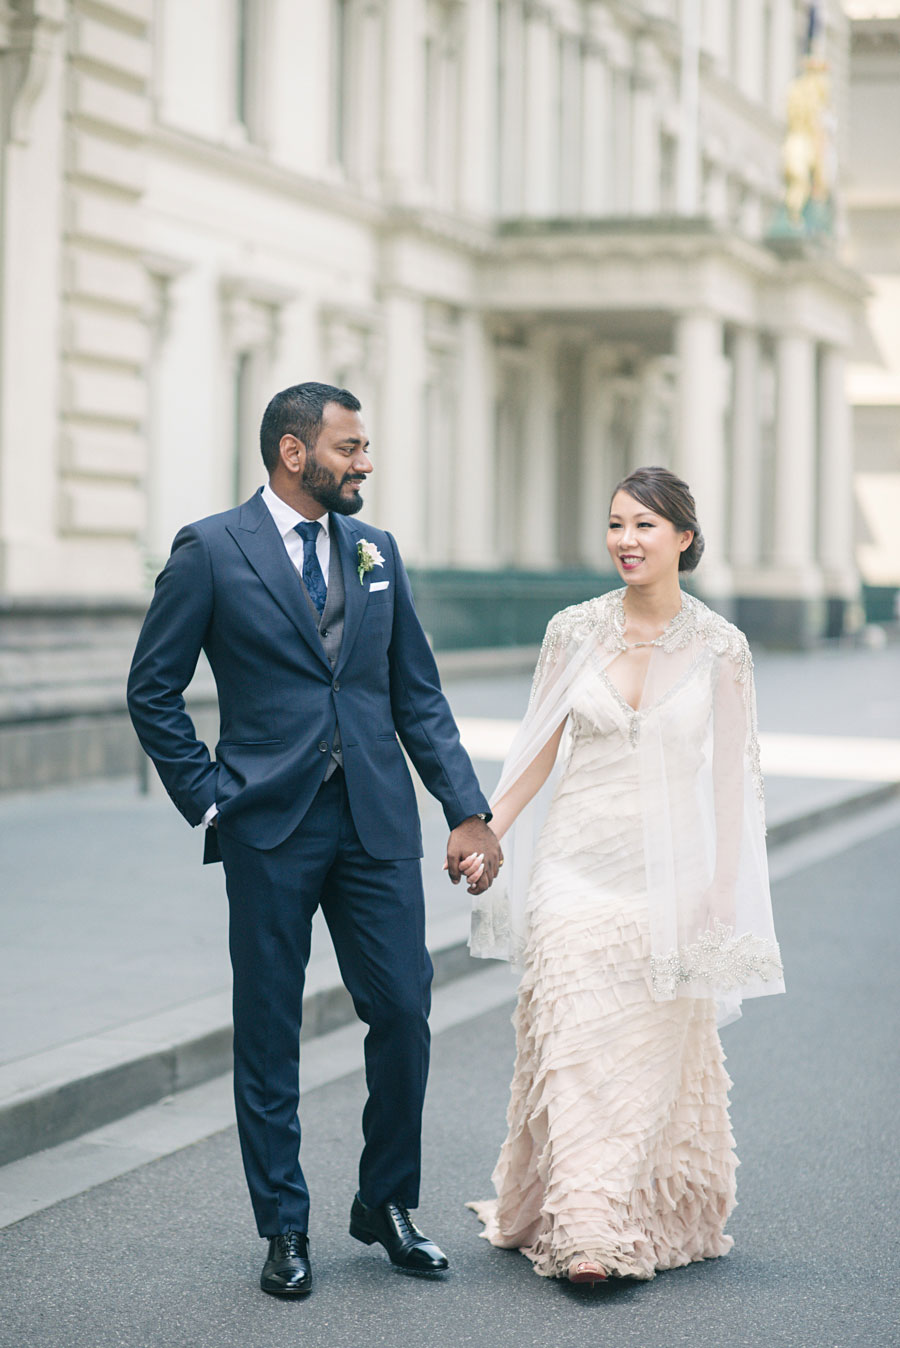 wedding-photography-melbourne-daniel-bilsborough-071.jpg